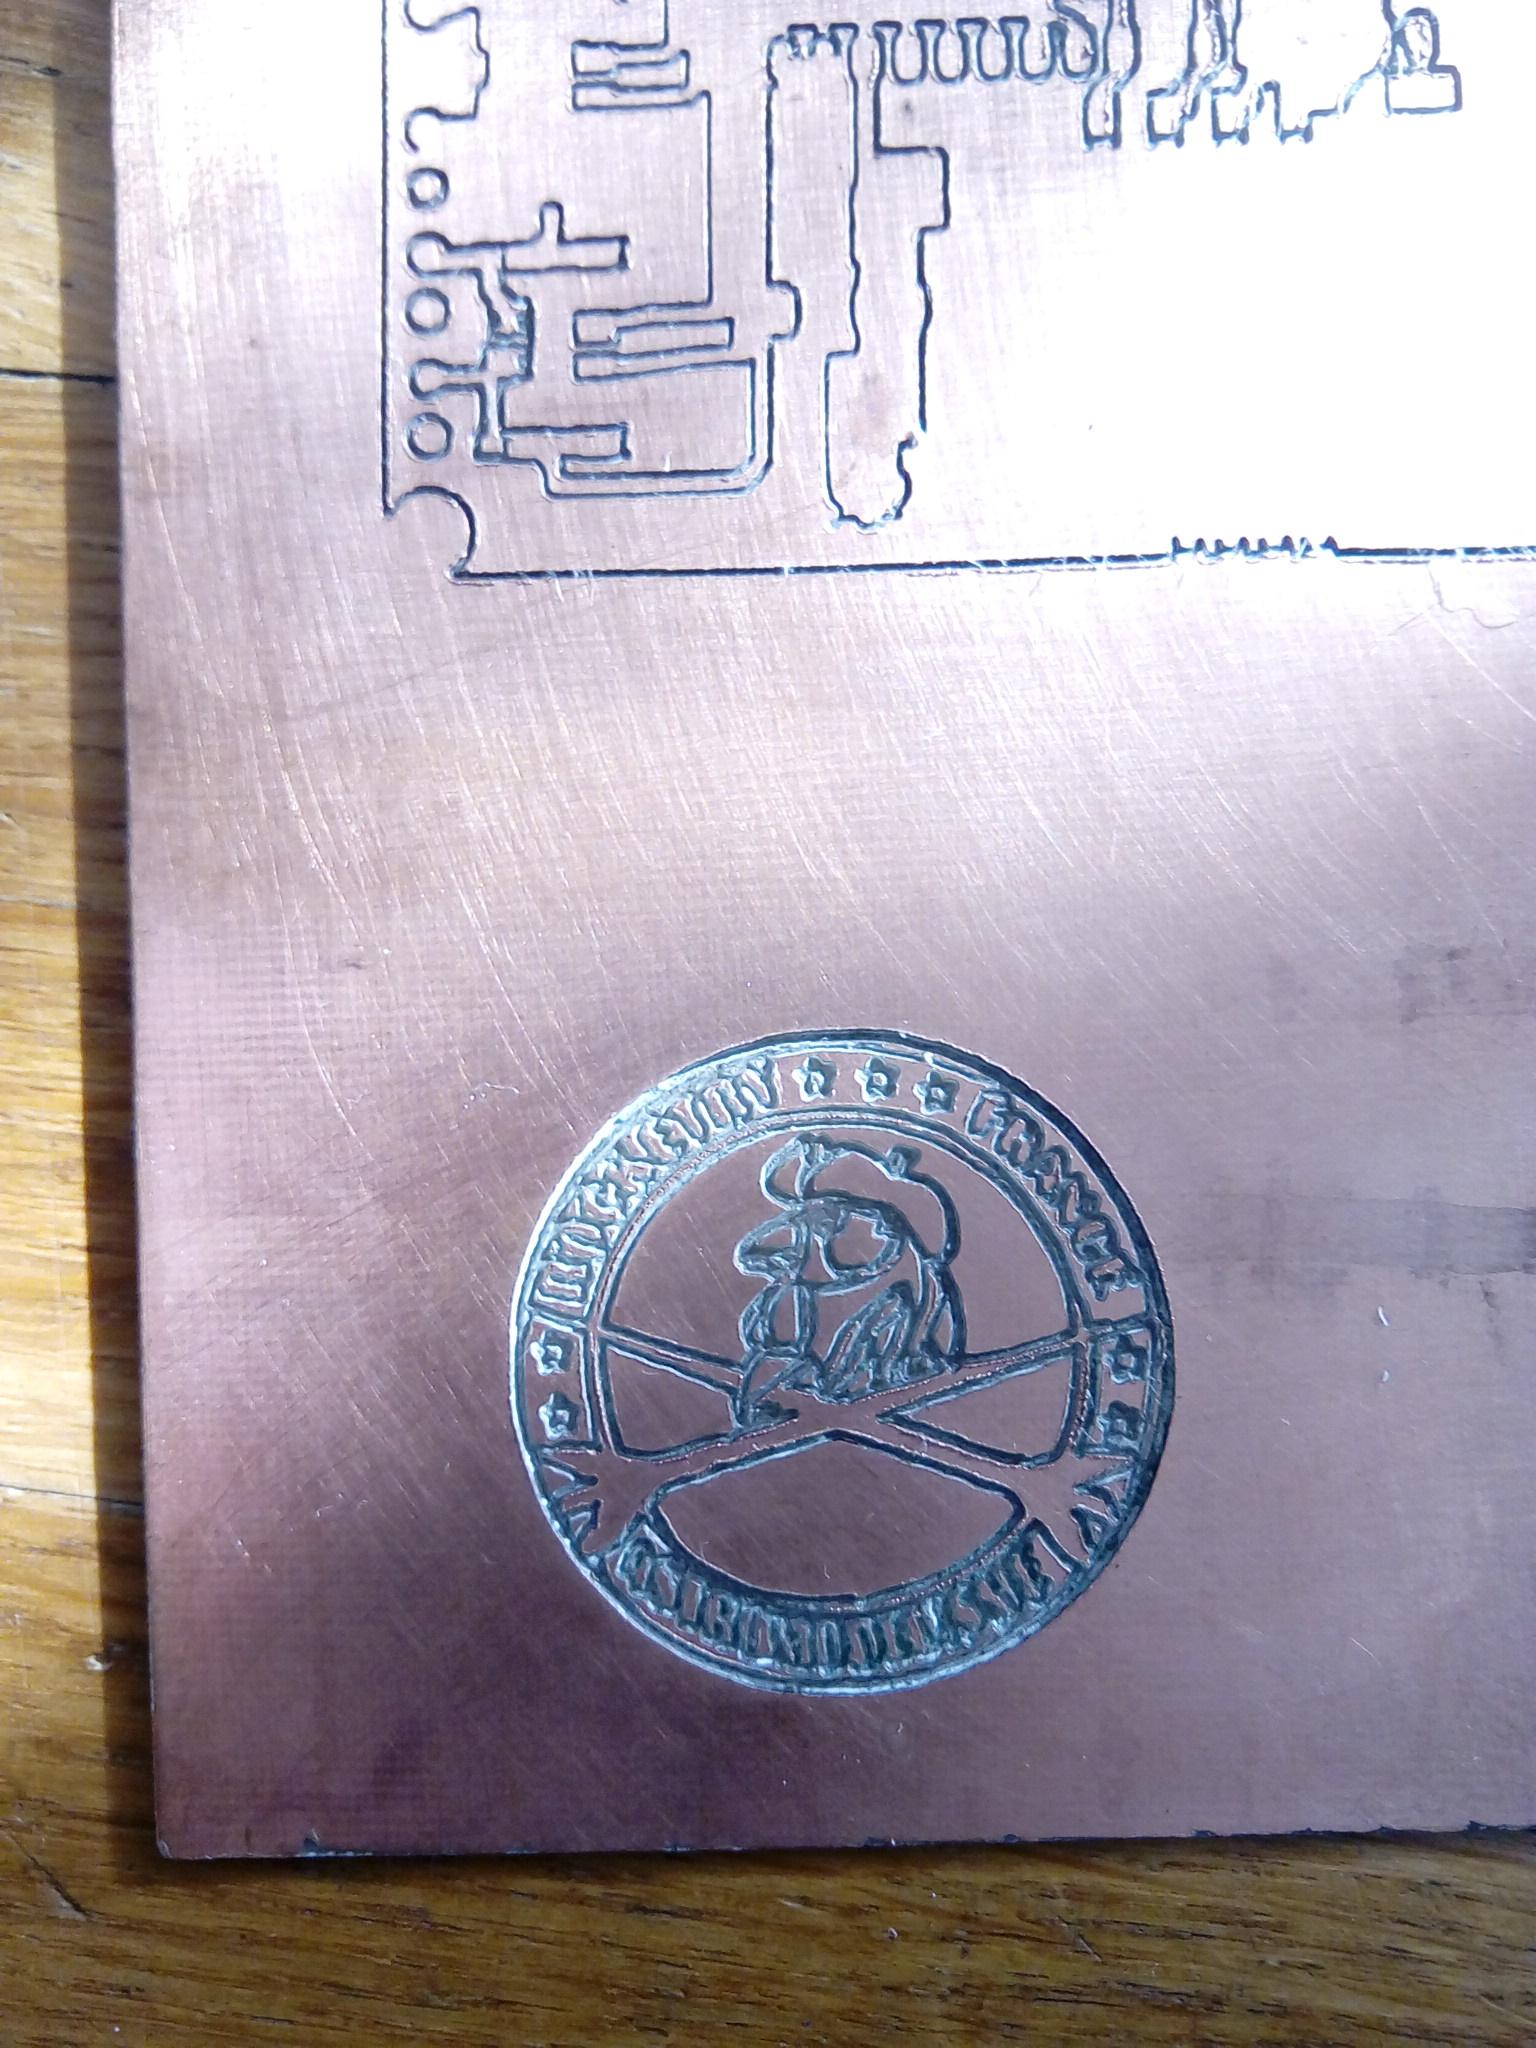 Petite CNC à 150 euros Gravur10